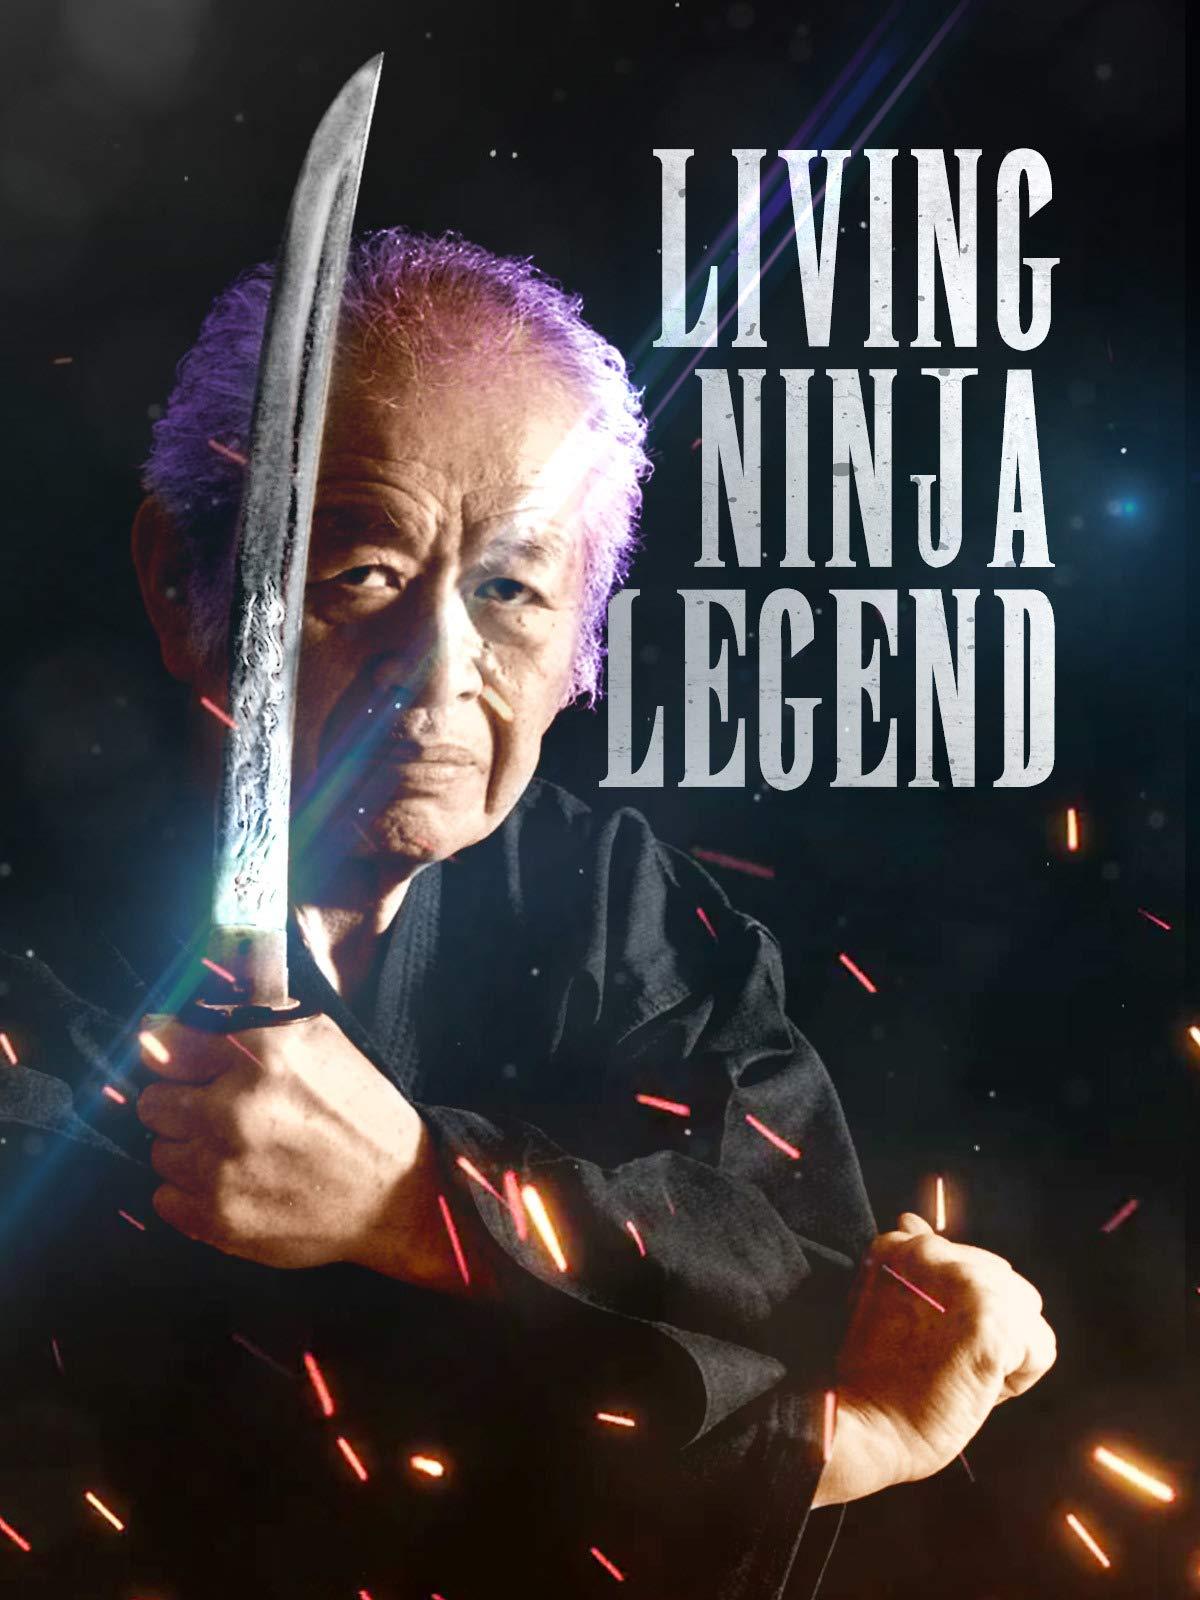 Watch Living Ninja Legend | Prime Video